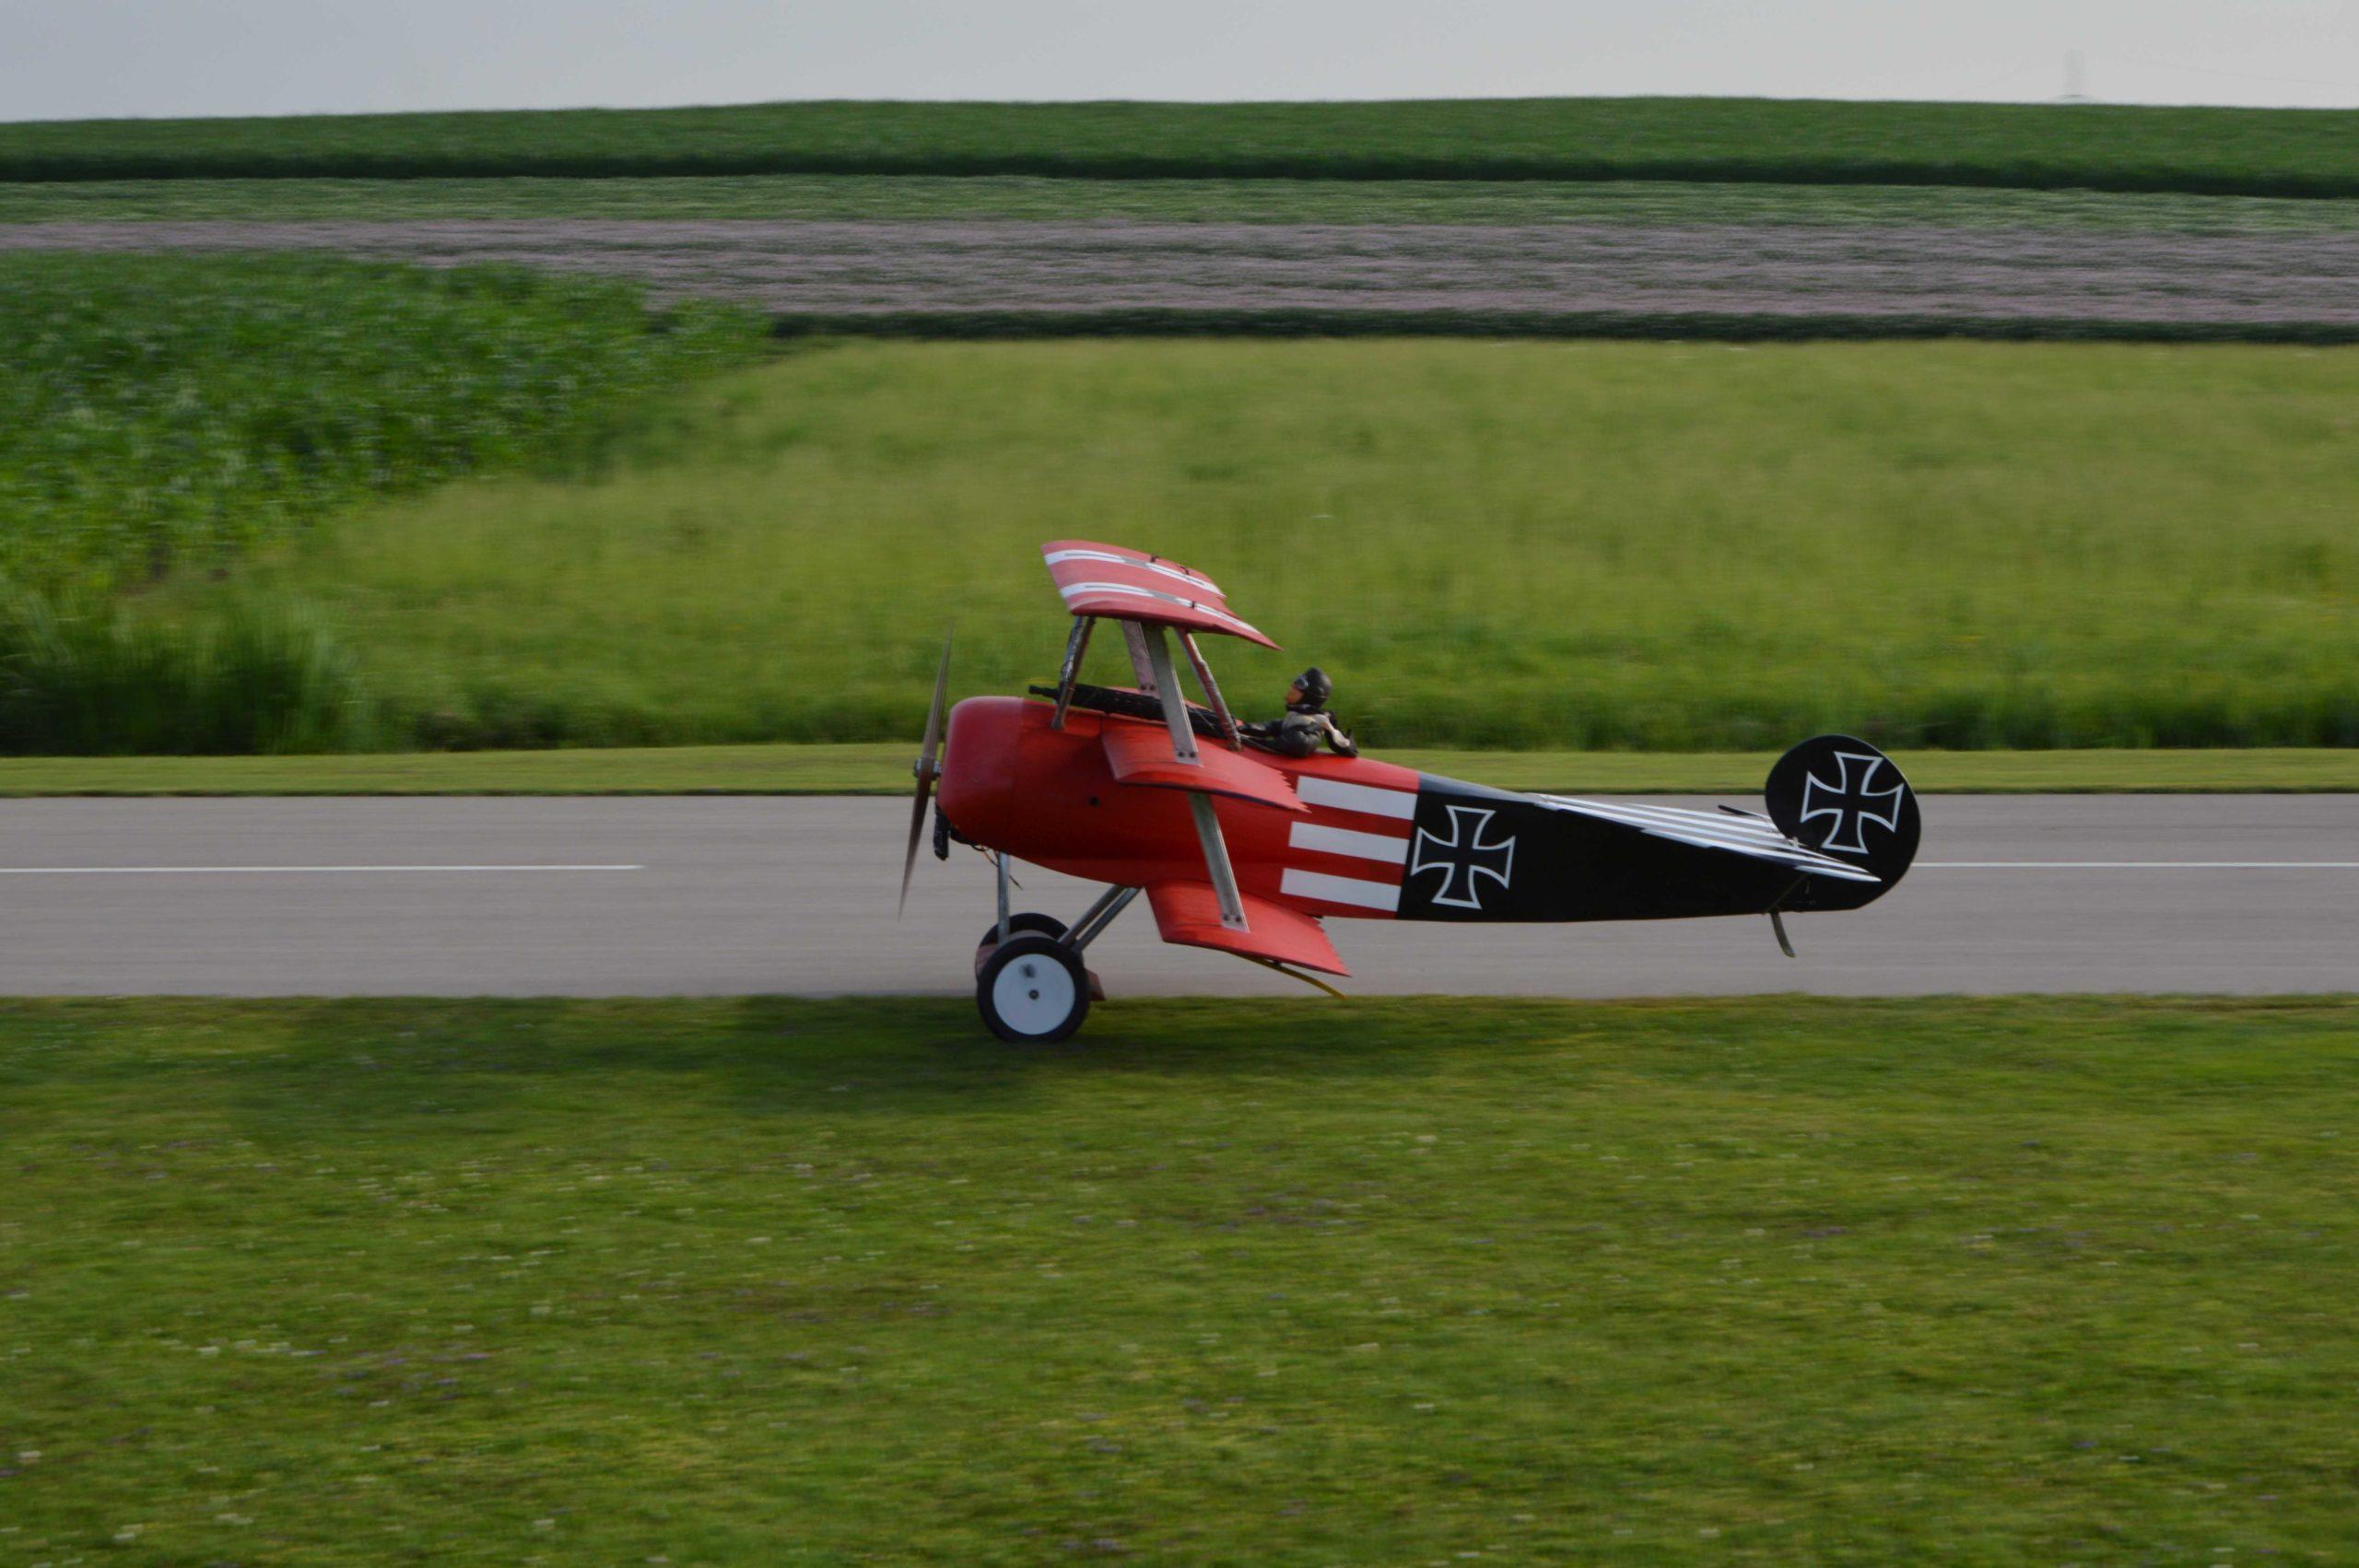 Interner Flugtag am 15.08.2021